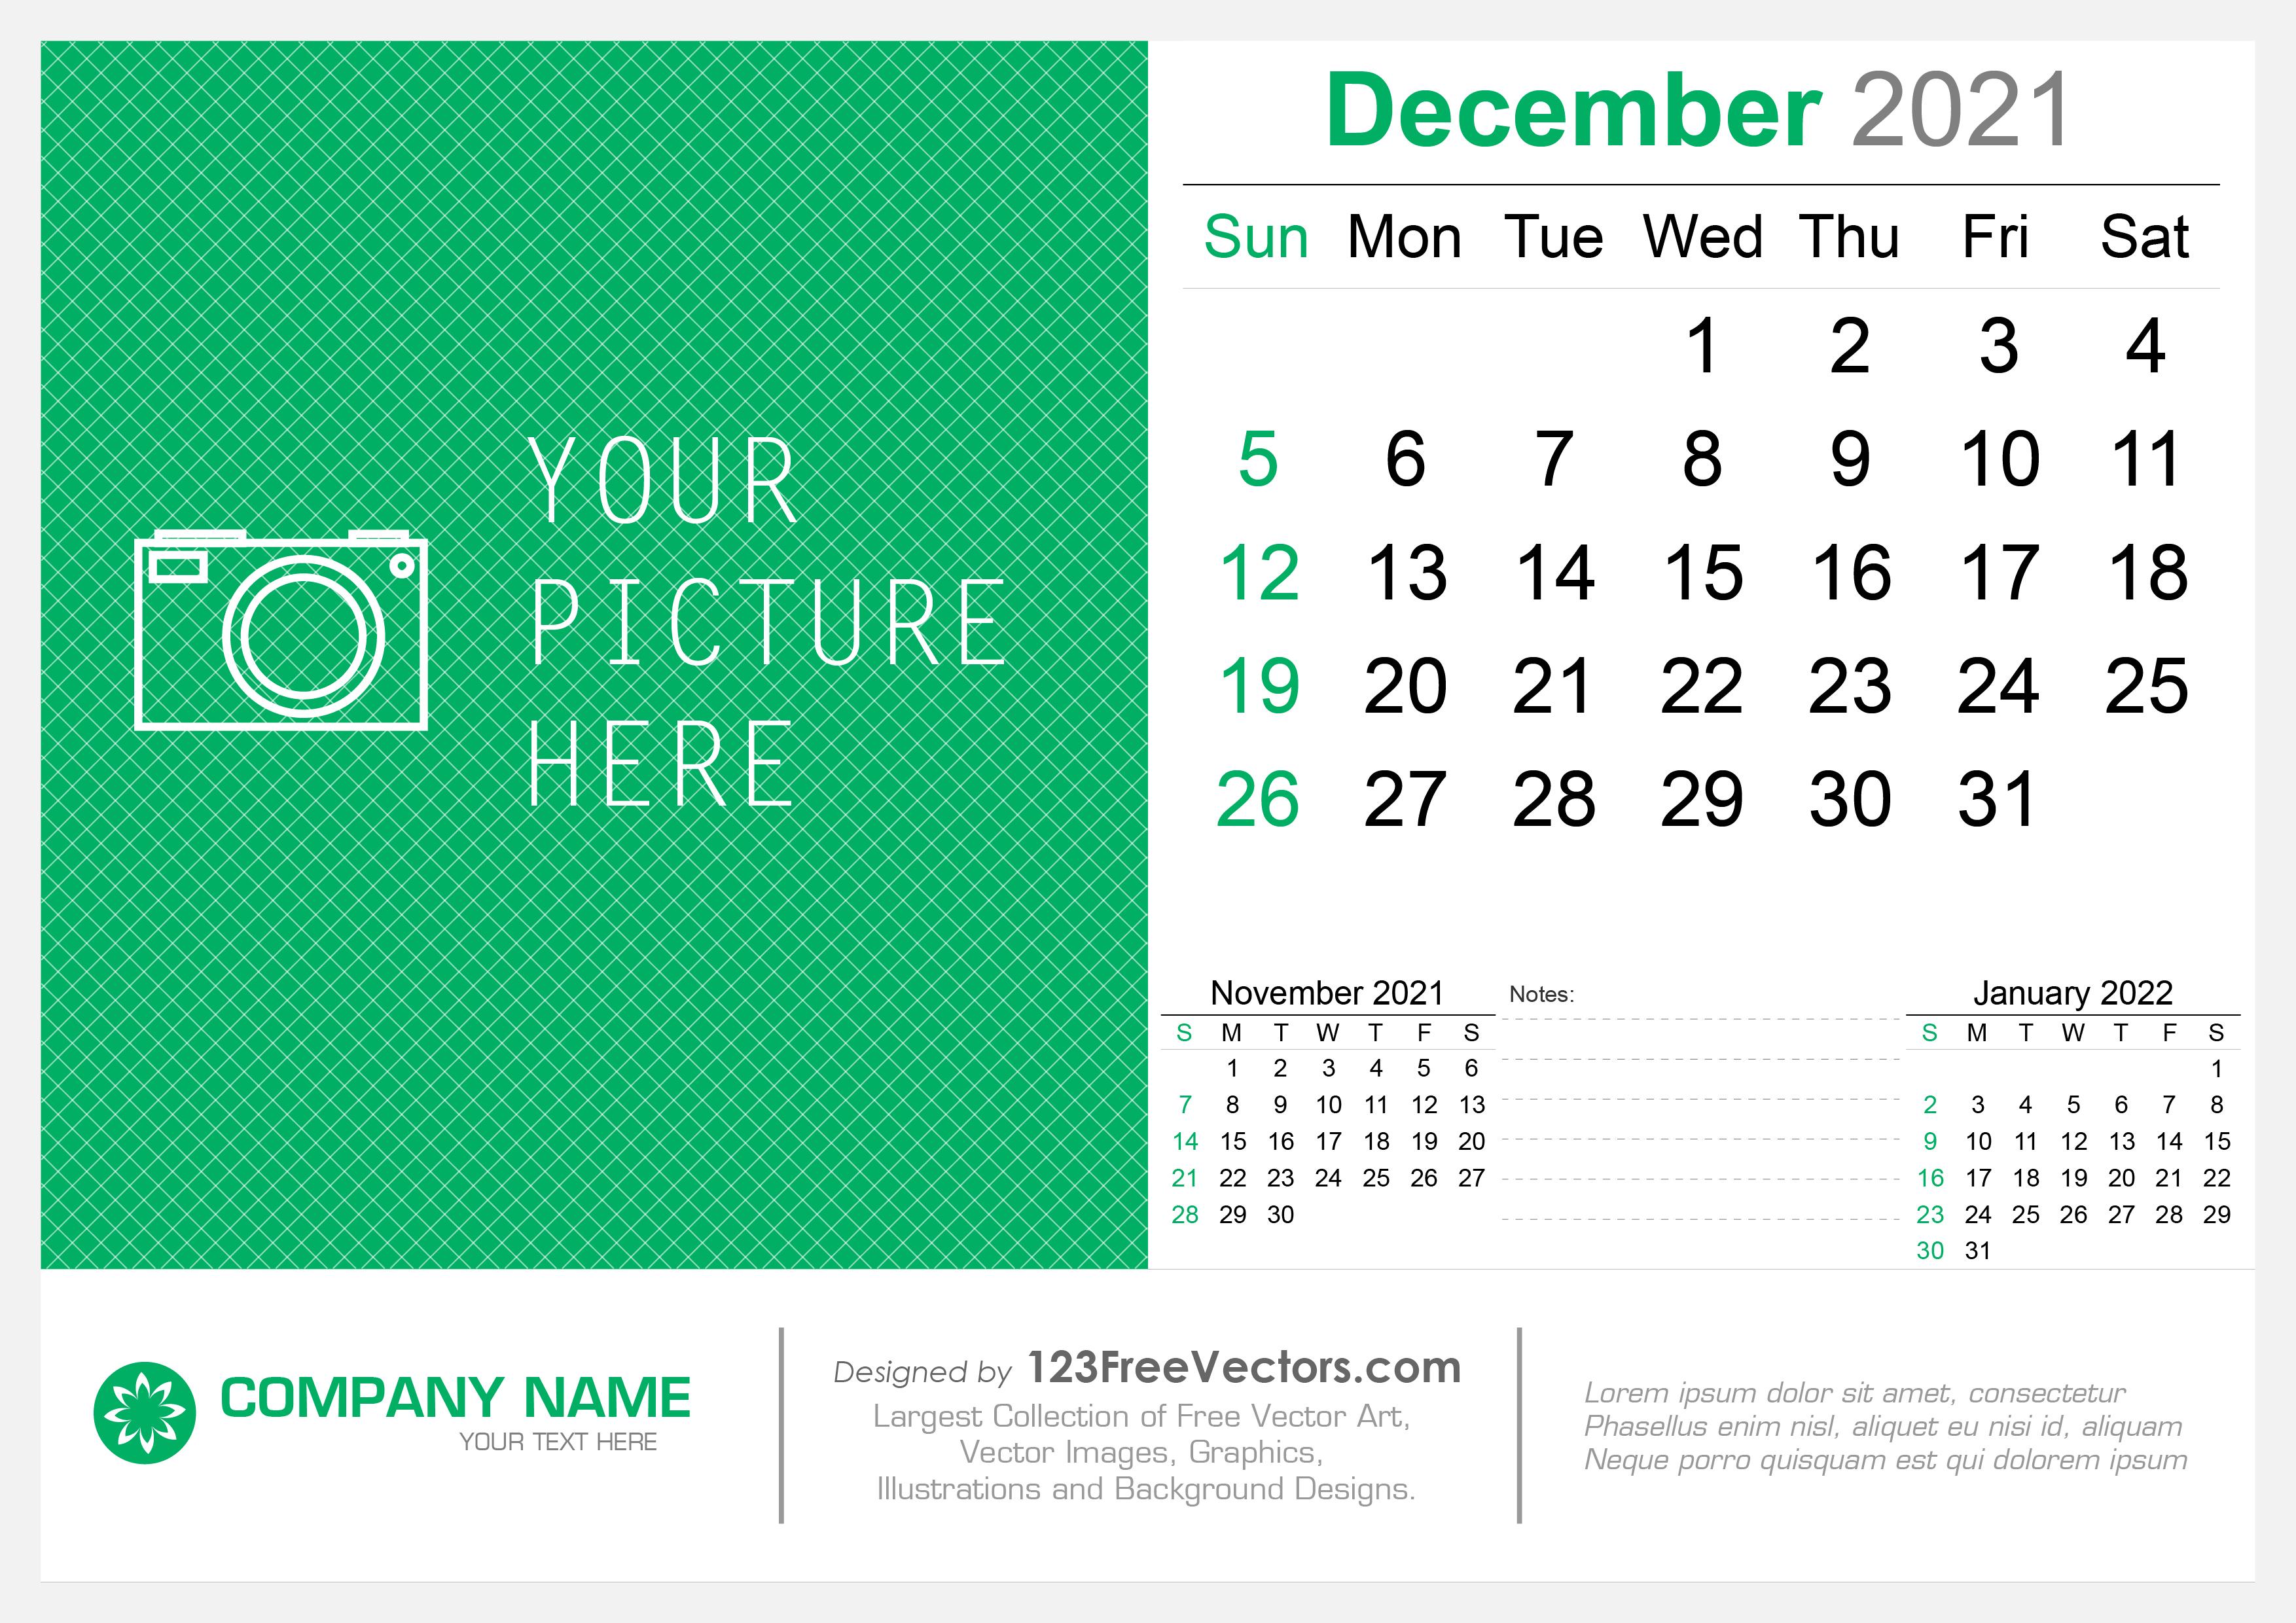 December 2021 Desktop Calendar